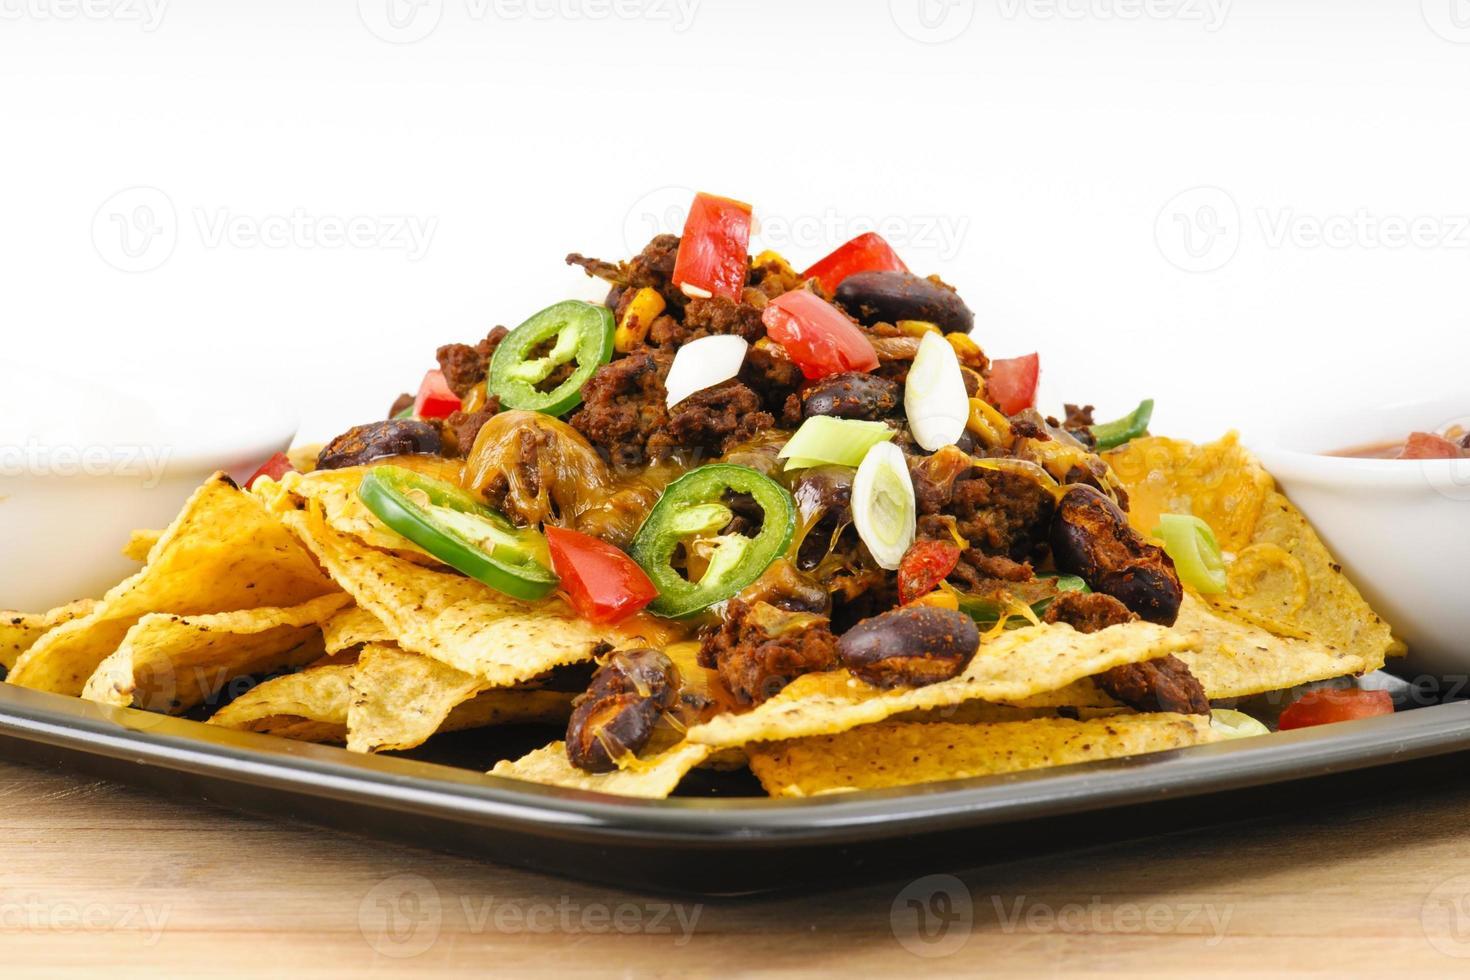 bocadillo de nacho con queso y chile foto